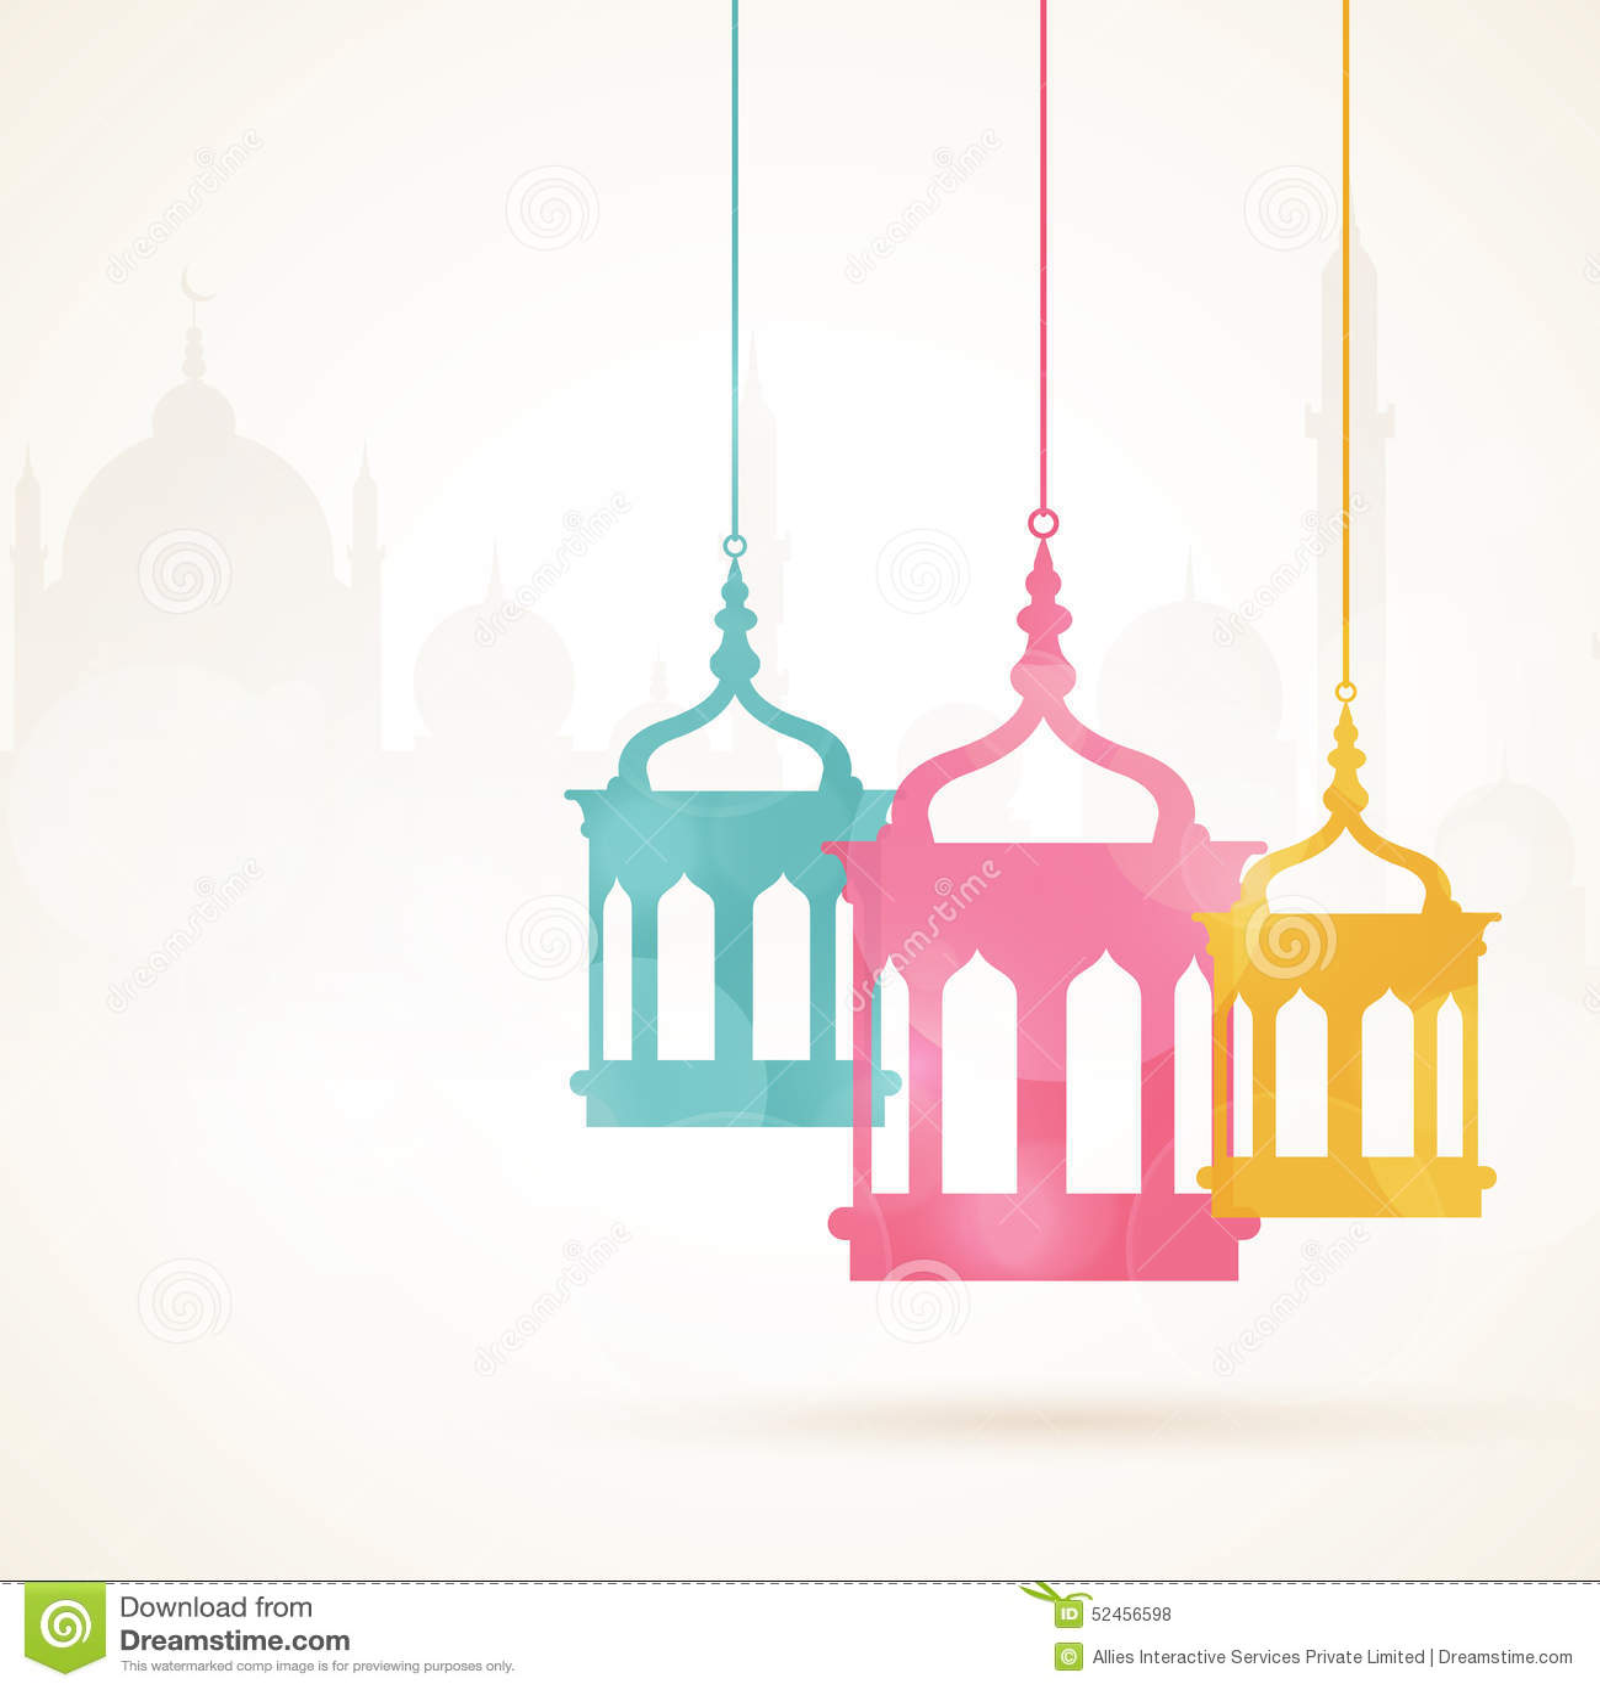 Ramadan Kareem Celebration With Colorful Hanging Arabic